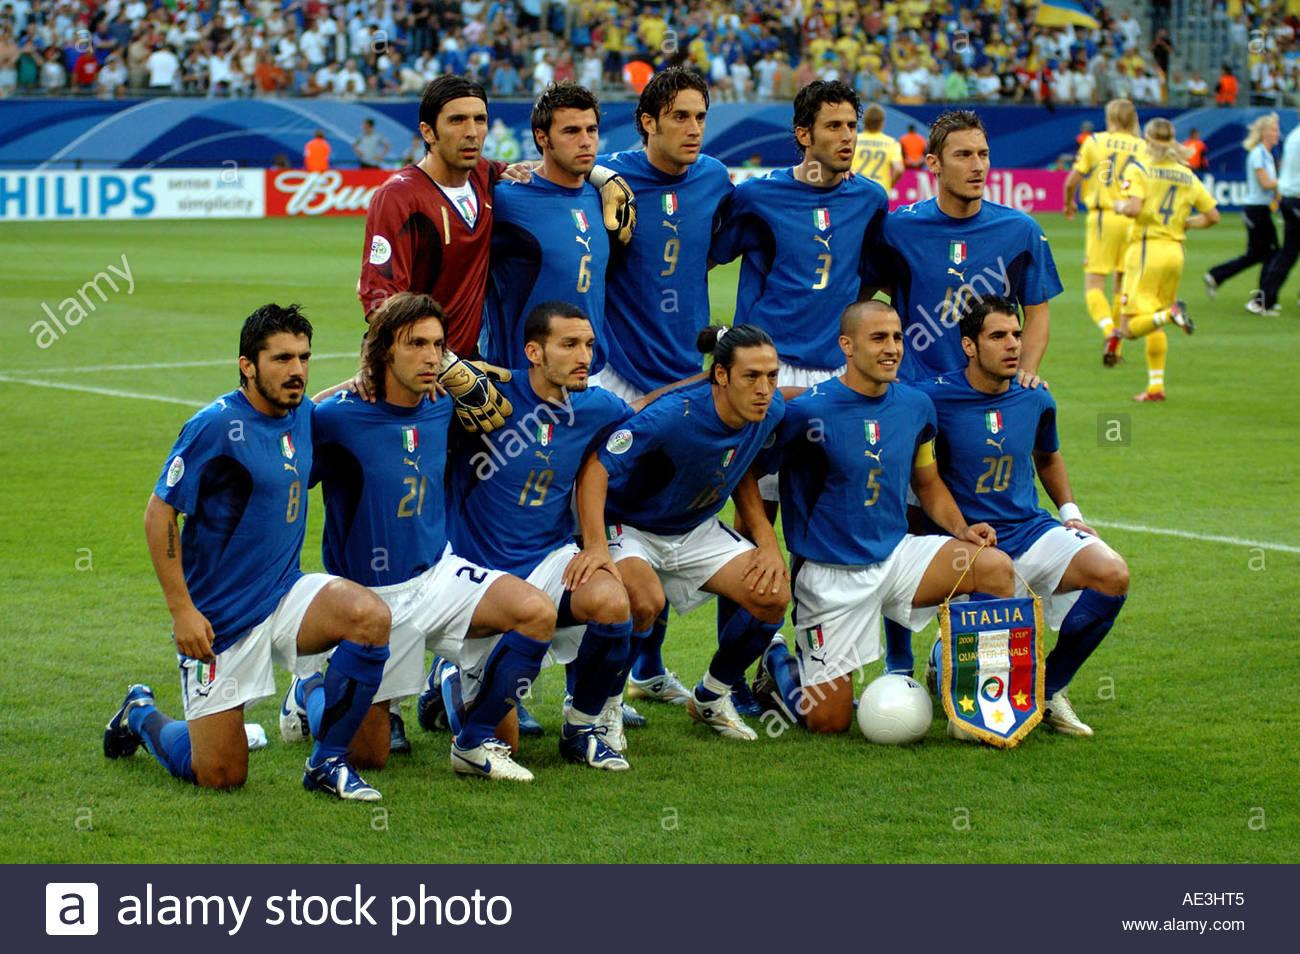 Italienische Mannschaft 2006